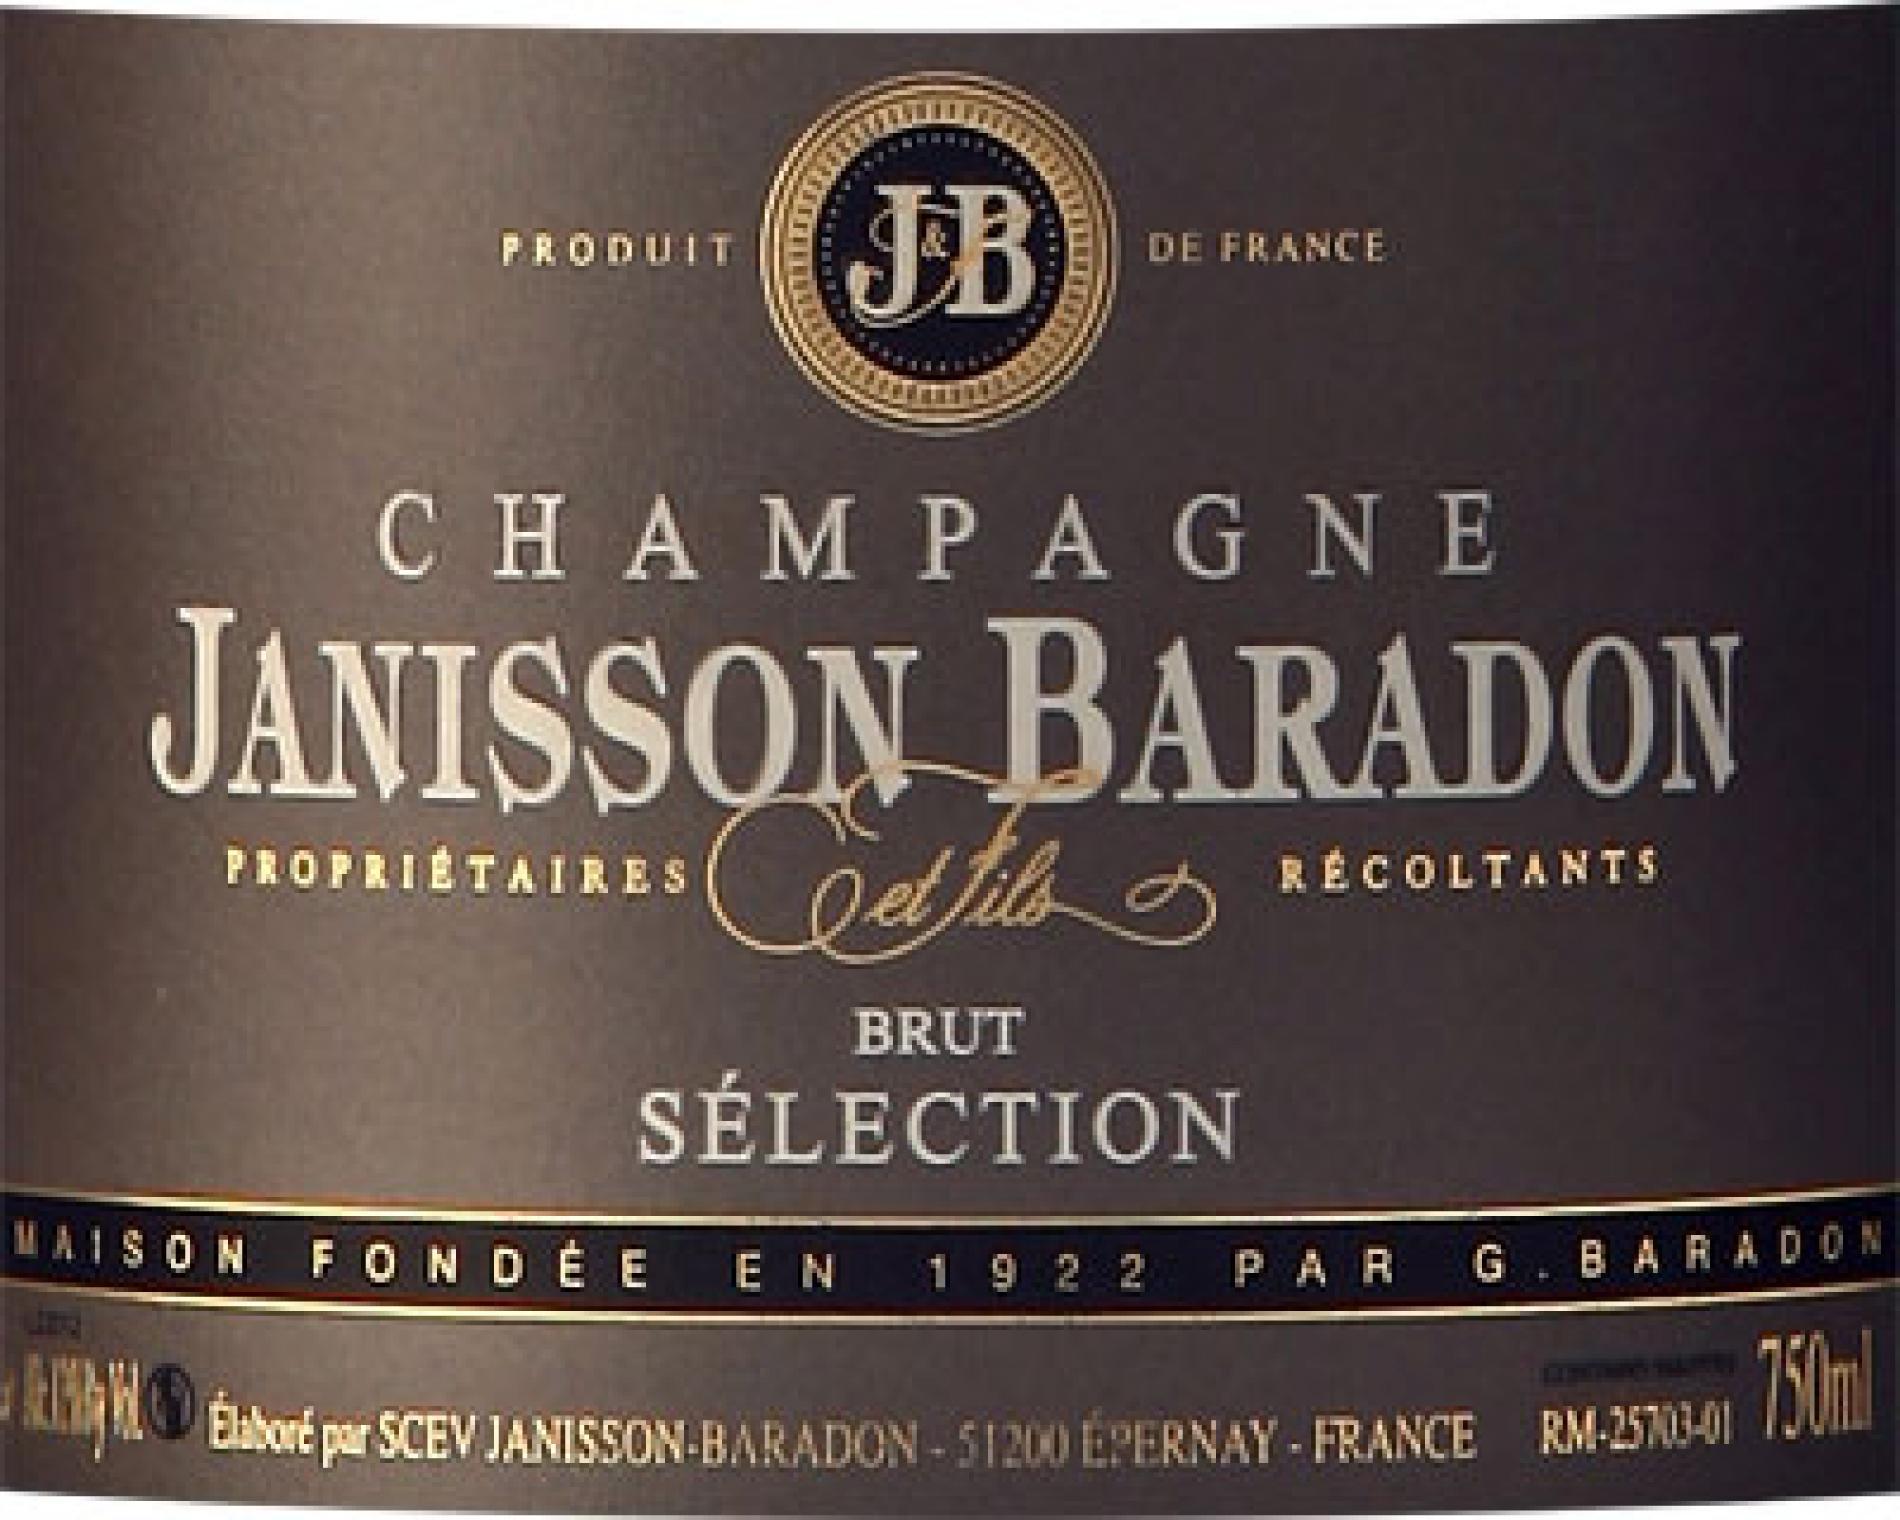 Champagne Janisson-Baradon